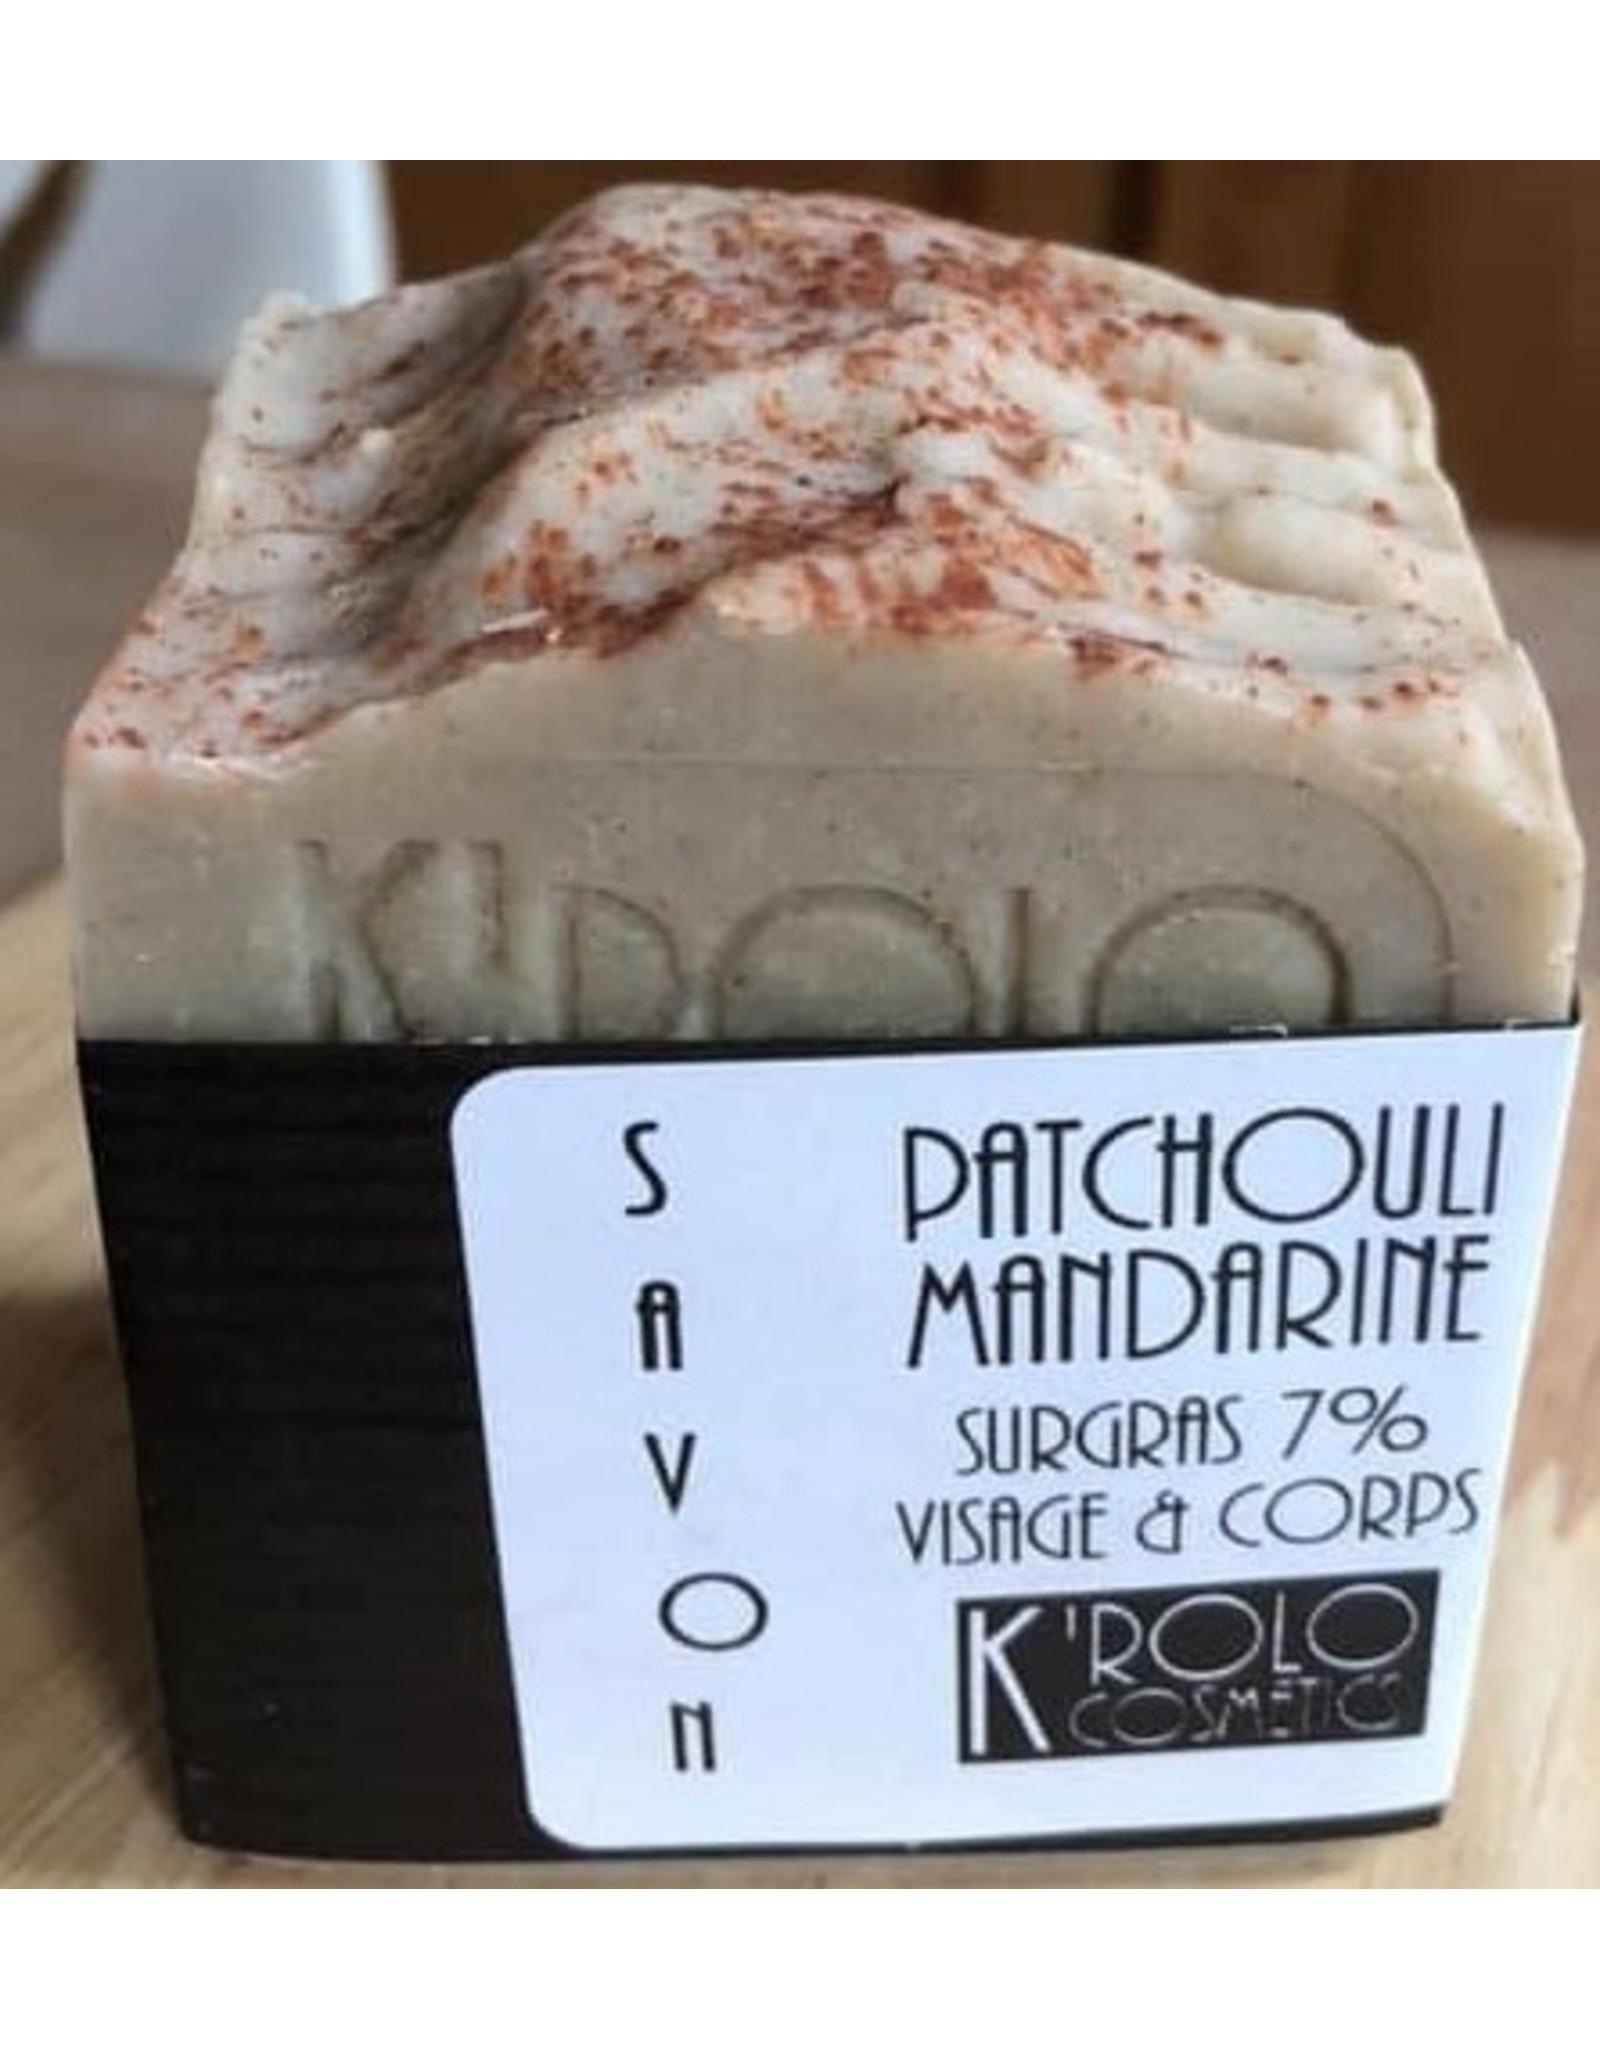 K'rolo Cosmetics savon Patchouli-mandarine